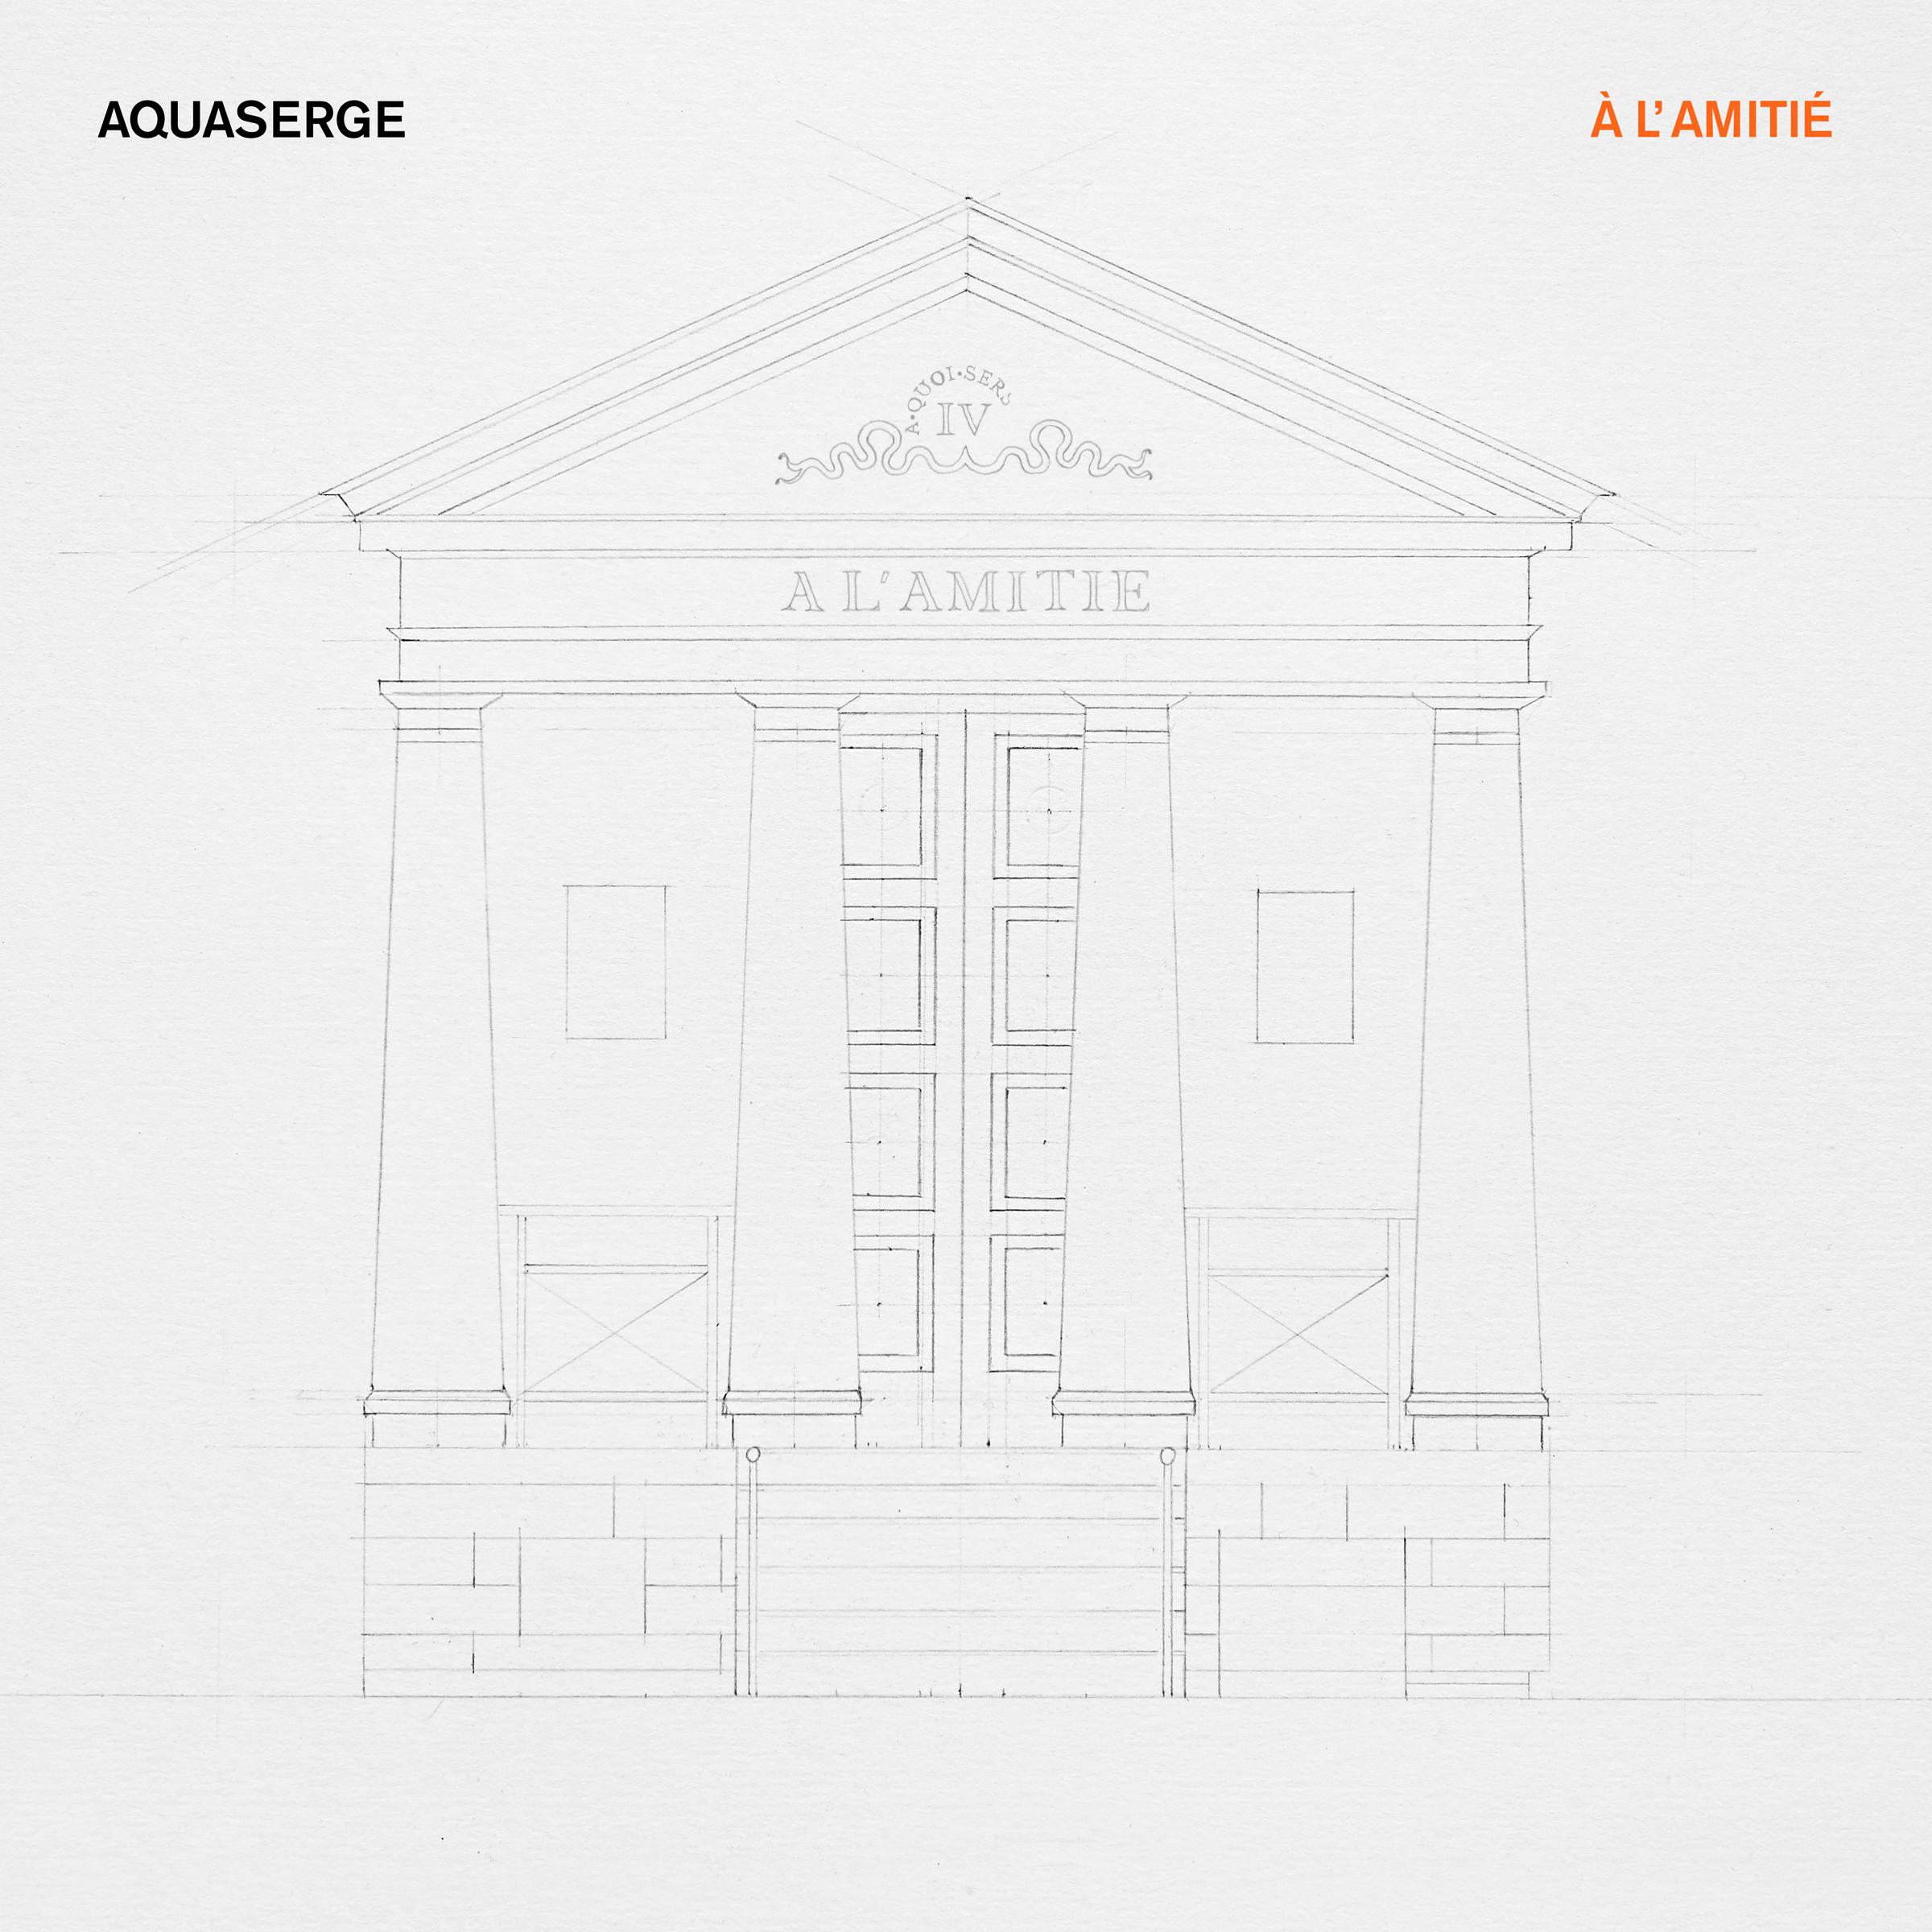 Aquaserge 'À l'amitié' cover